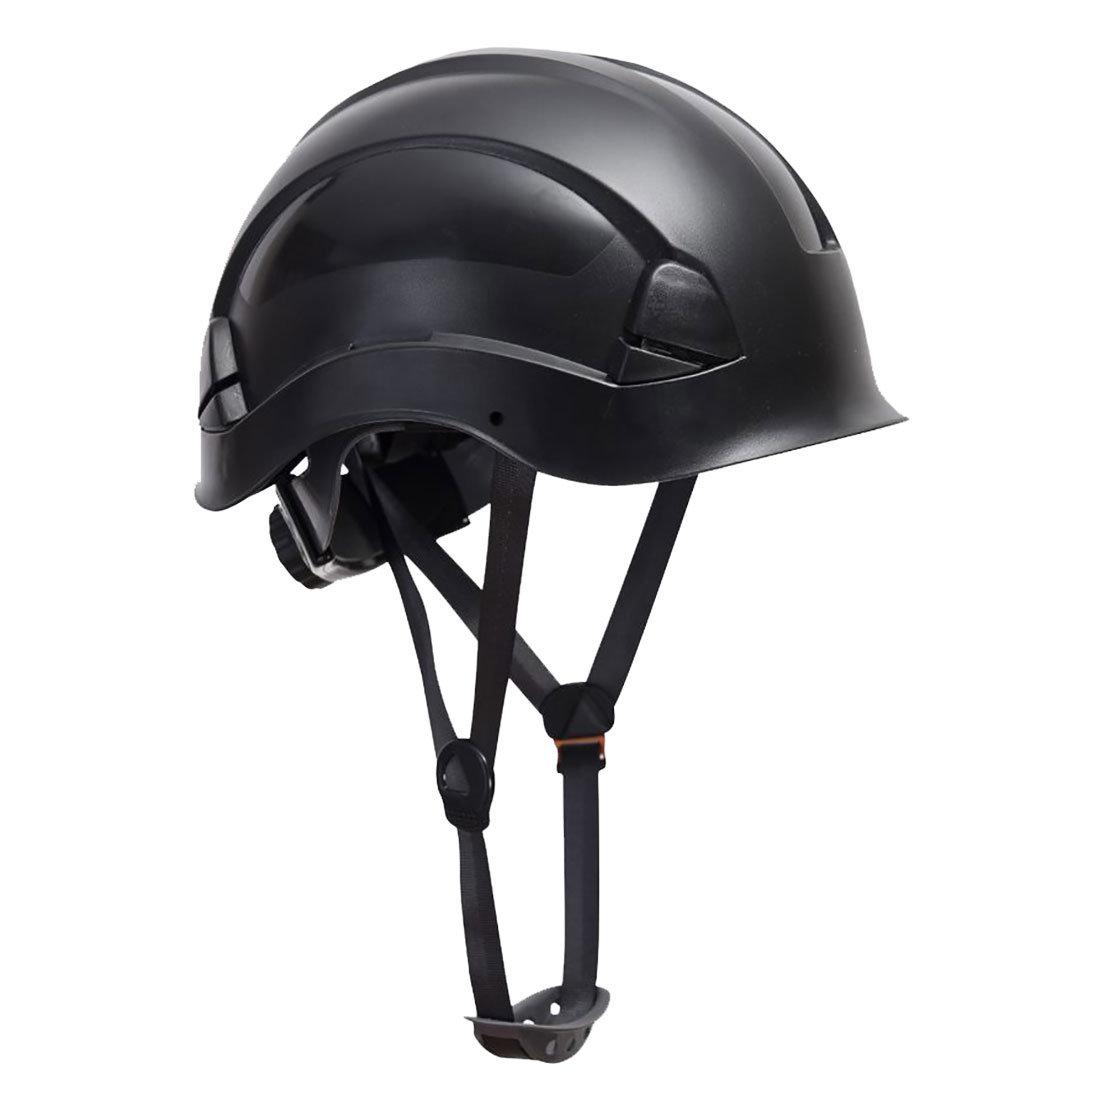 Redrok Workwear Centre Plymouth - Height Endurance Helmet - Black Black